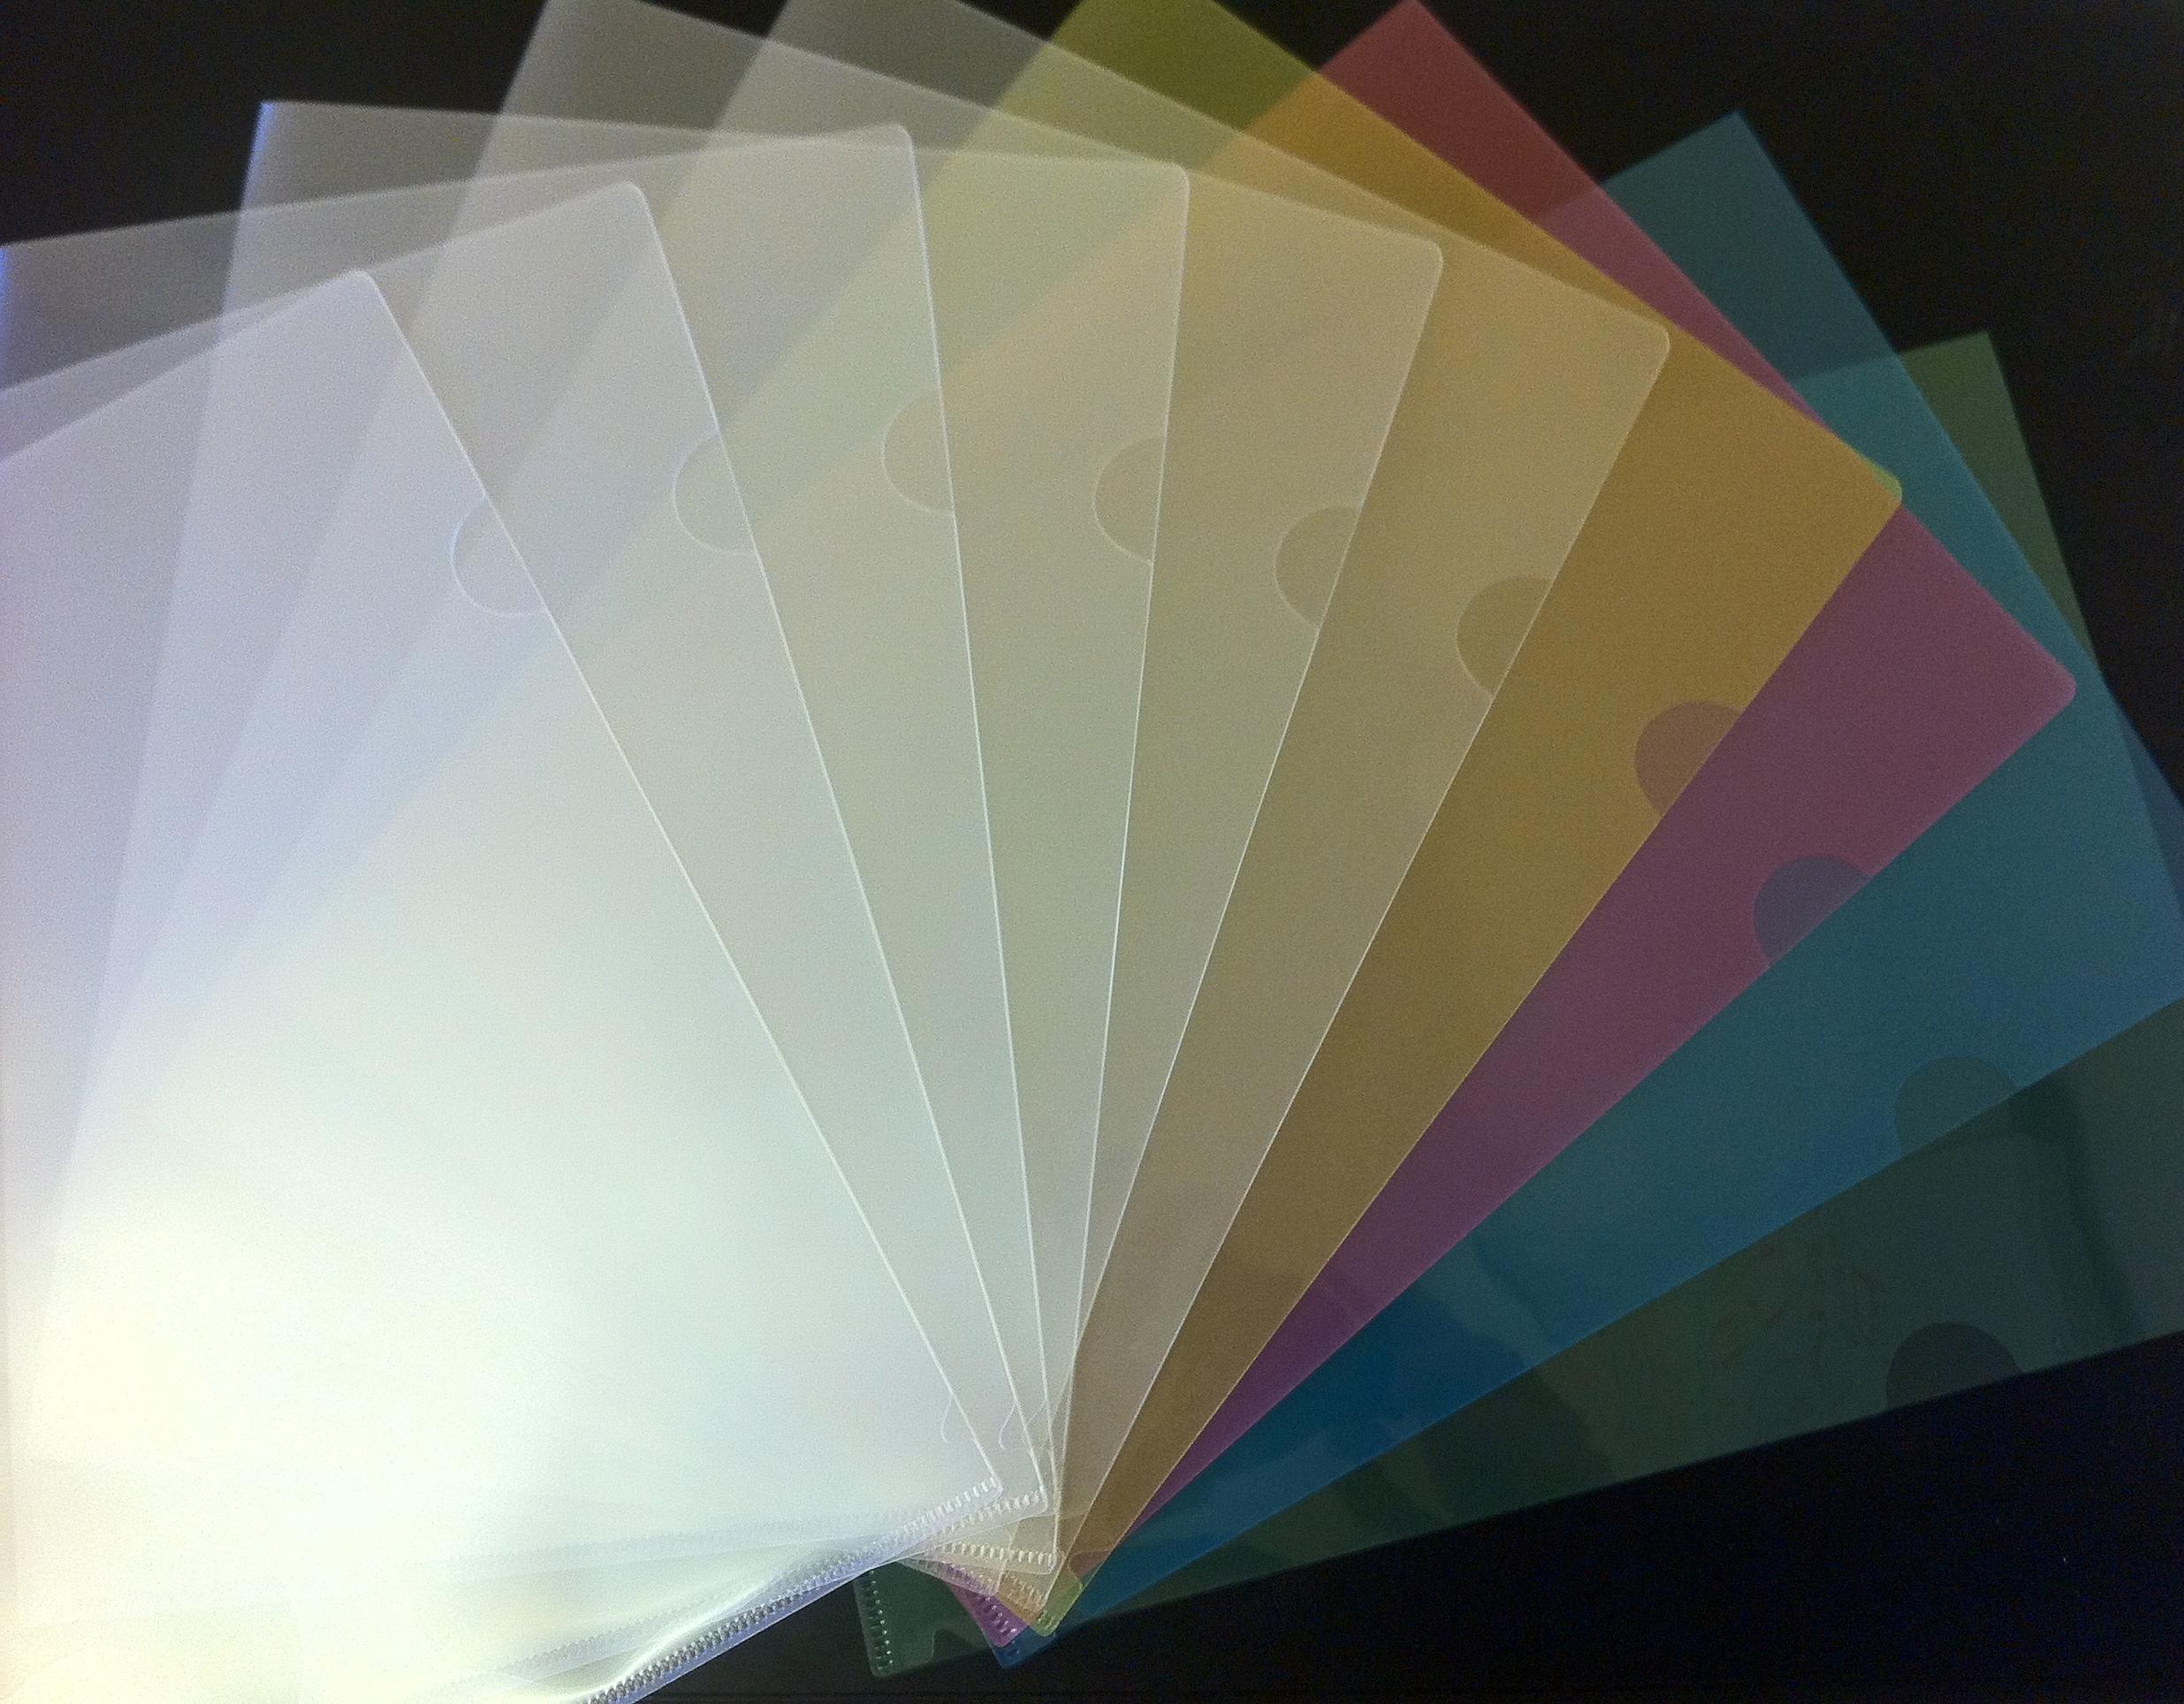 110 Colour A4 Plastic Document Holders Folders